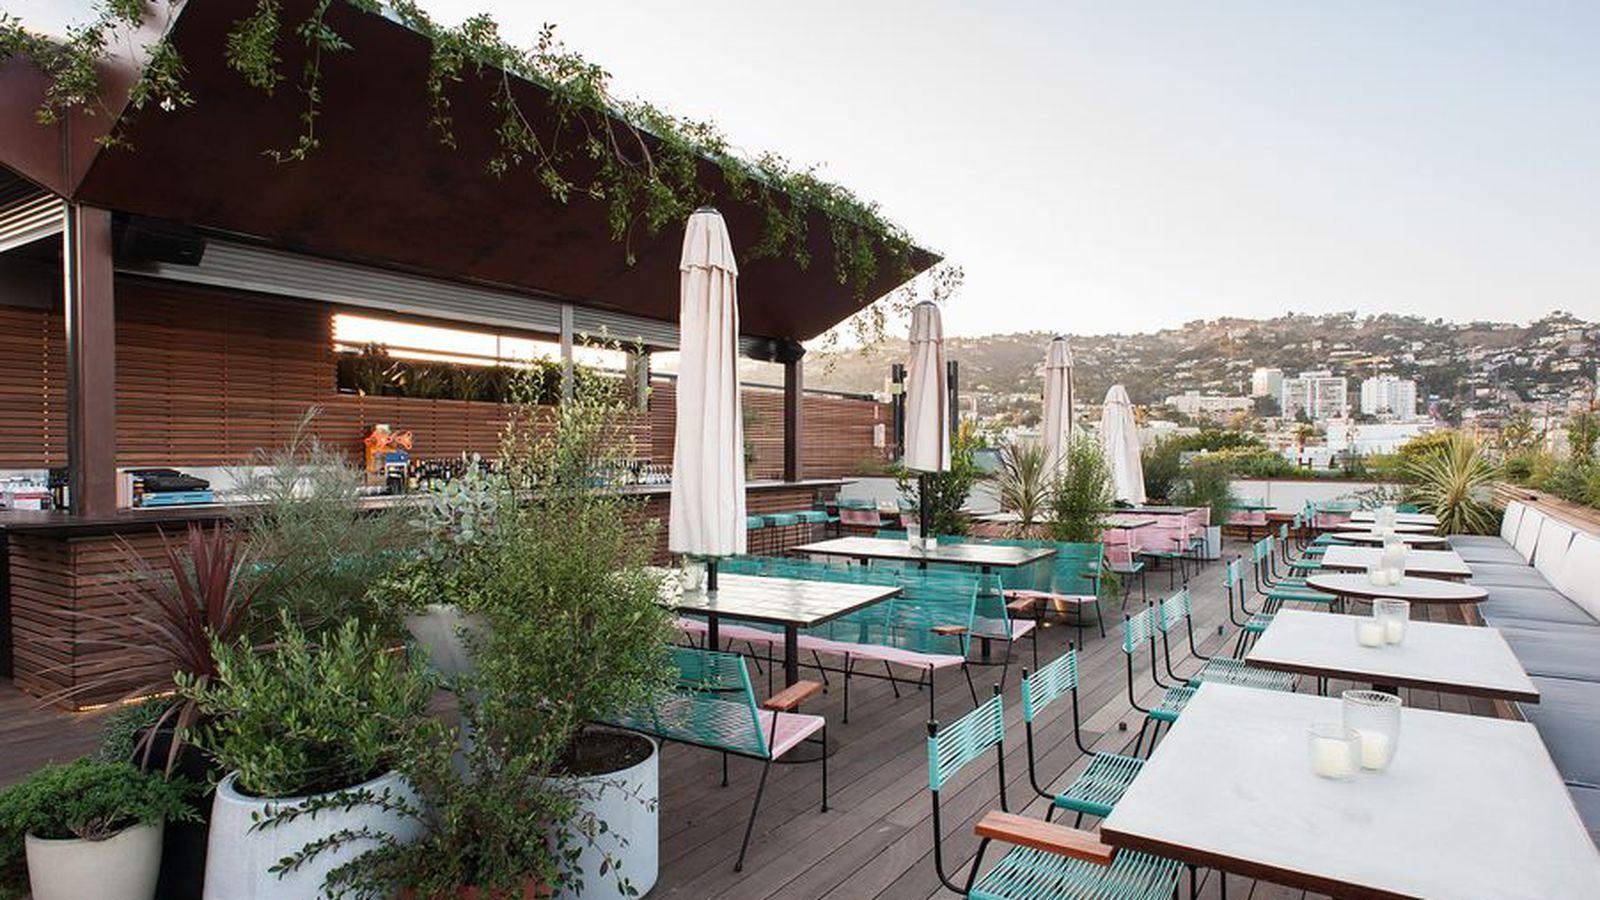 Outdoor Dining Restaurants In Los Angeles, Spring 2016